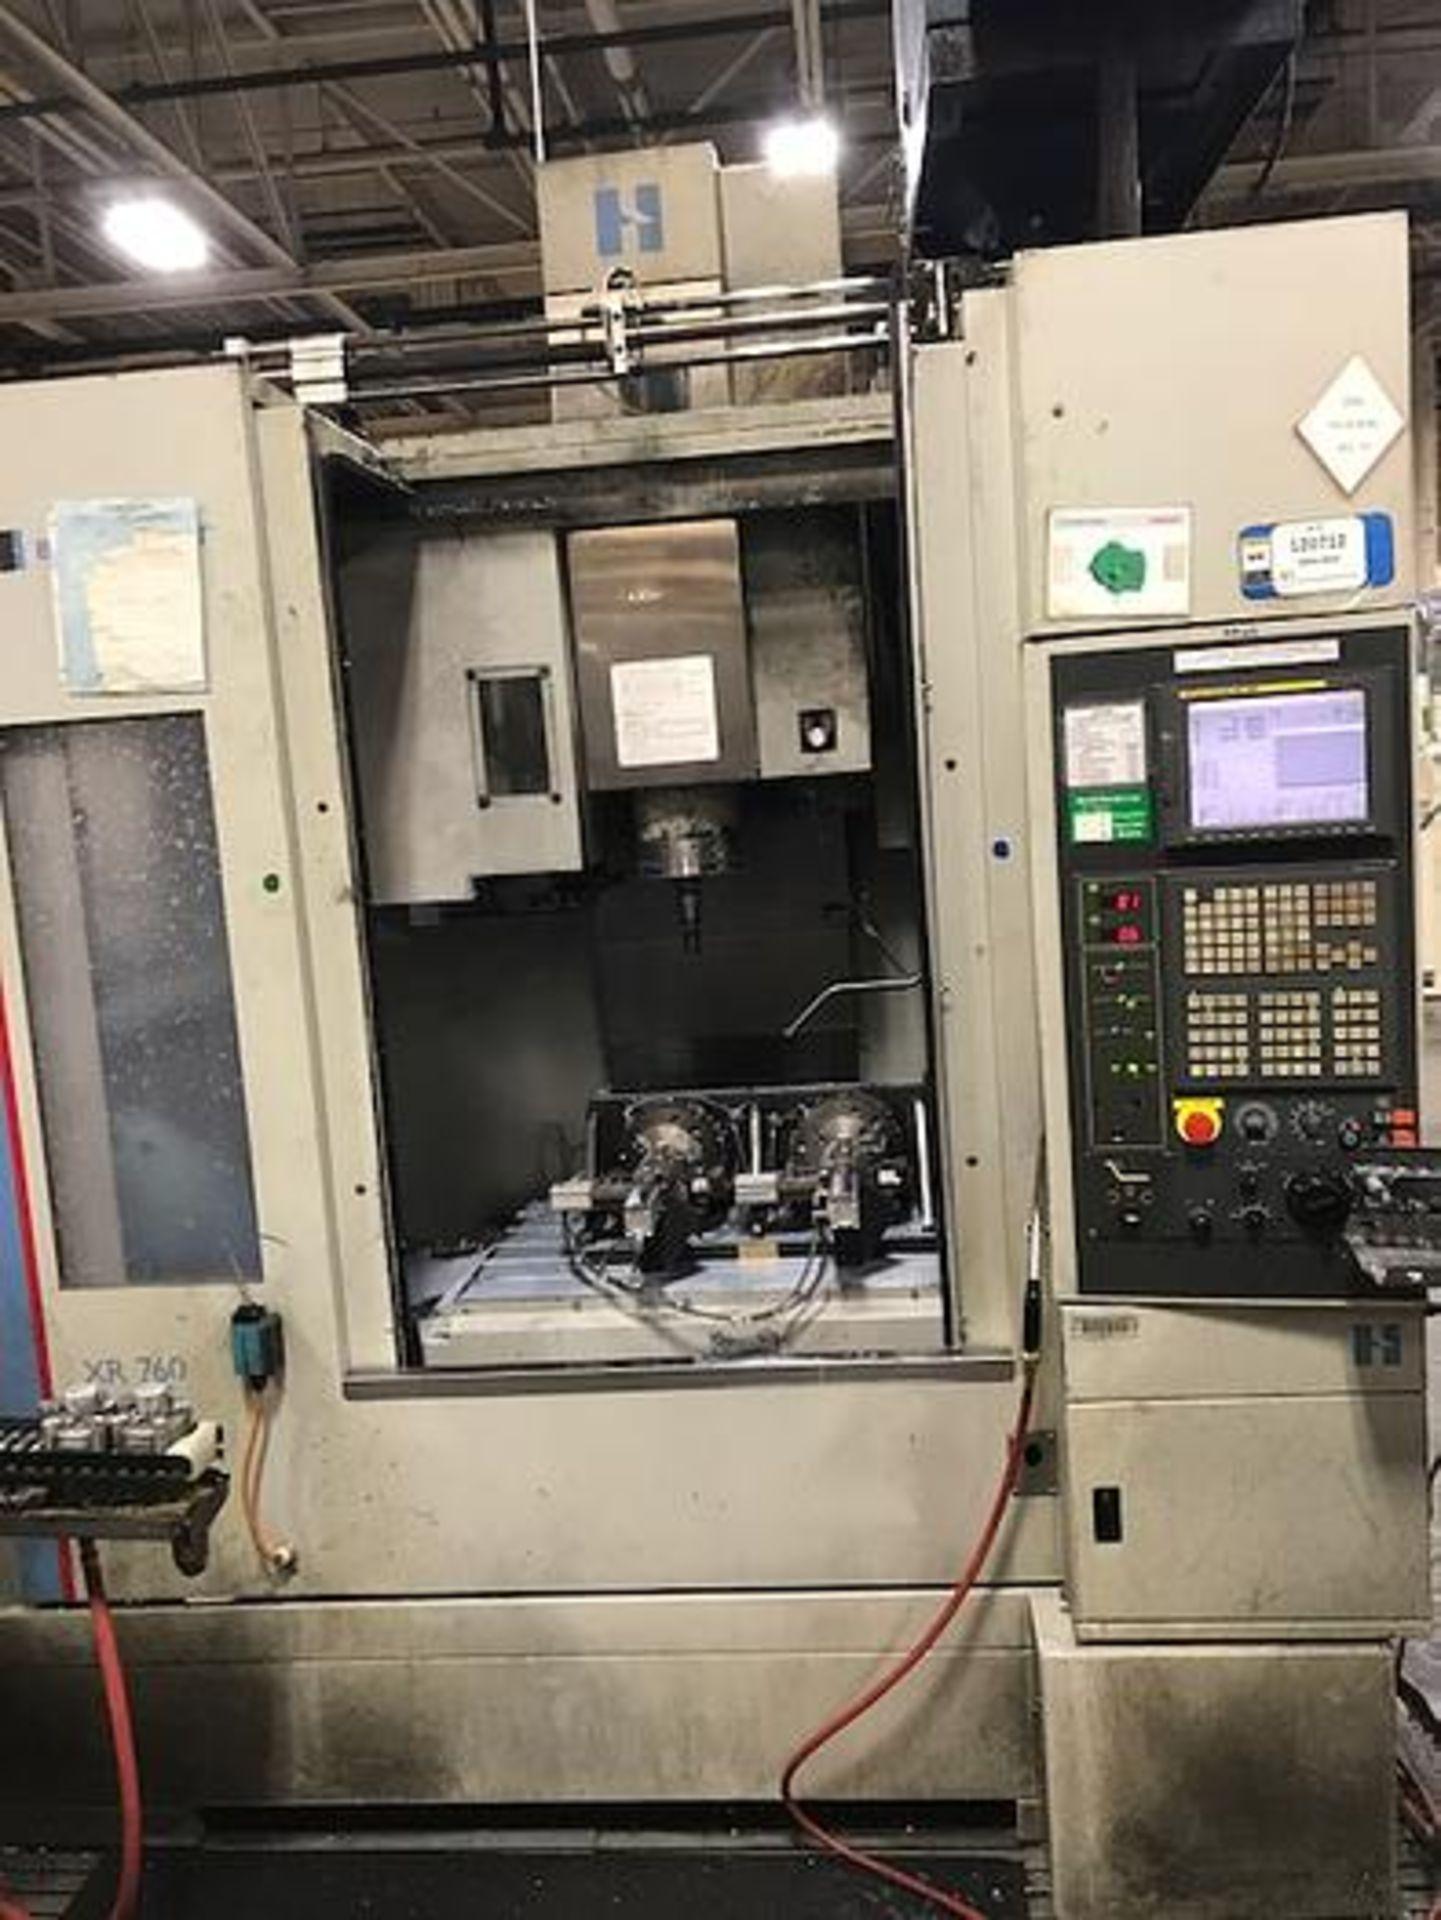 "HARDINGE XR760 CNC VMC PRODUCTION CENTER 30""X24""X24"", YEAR 2010, SN XRAB0A0001"